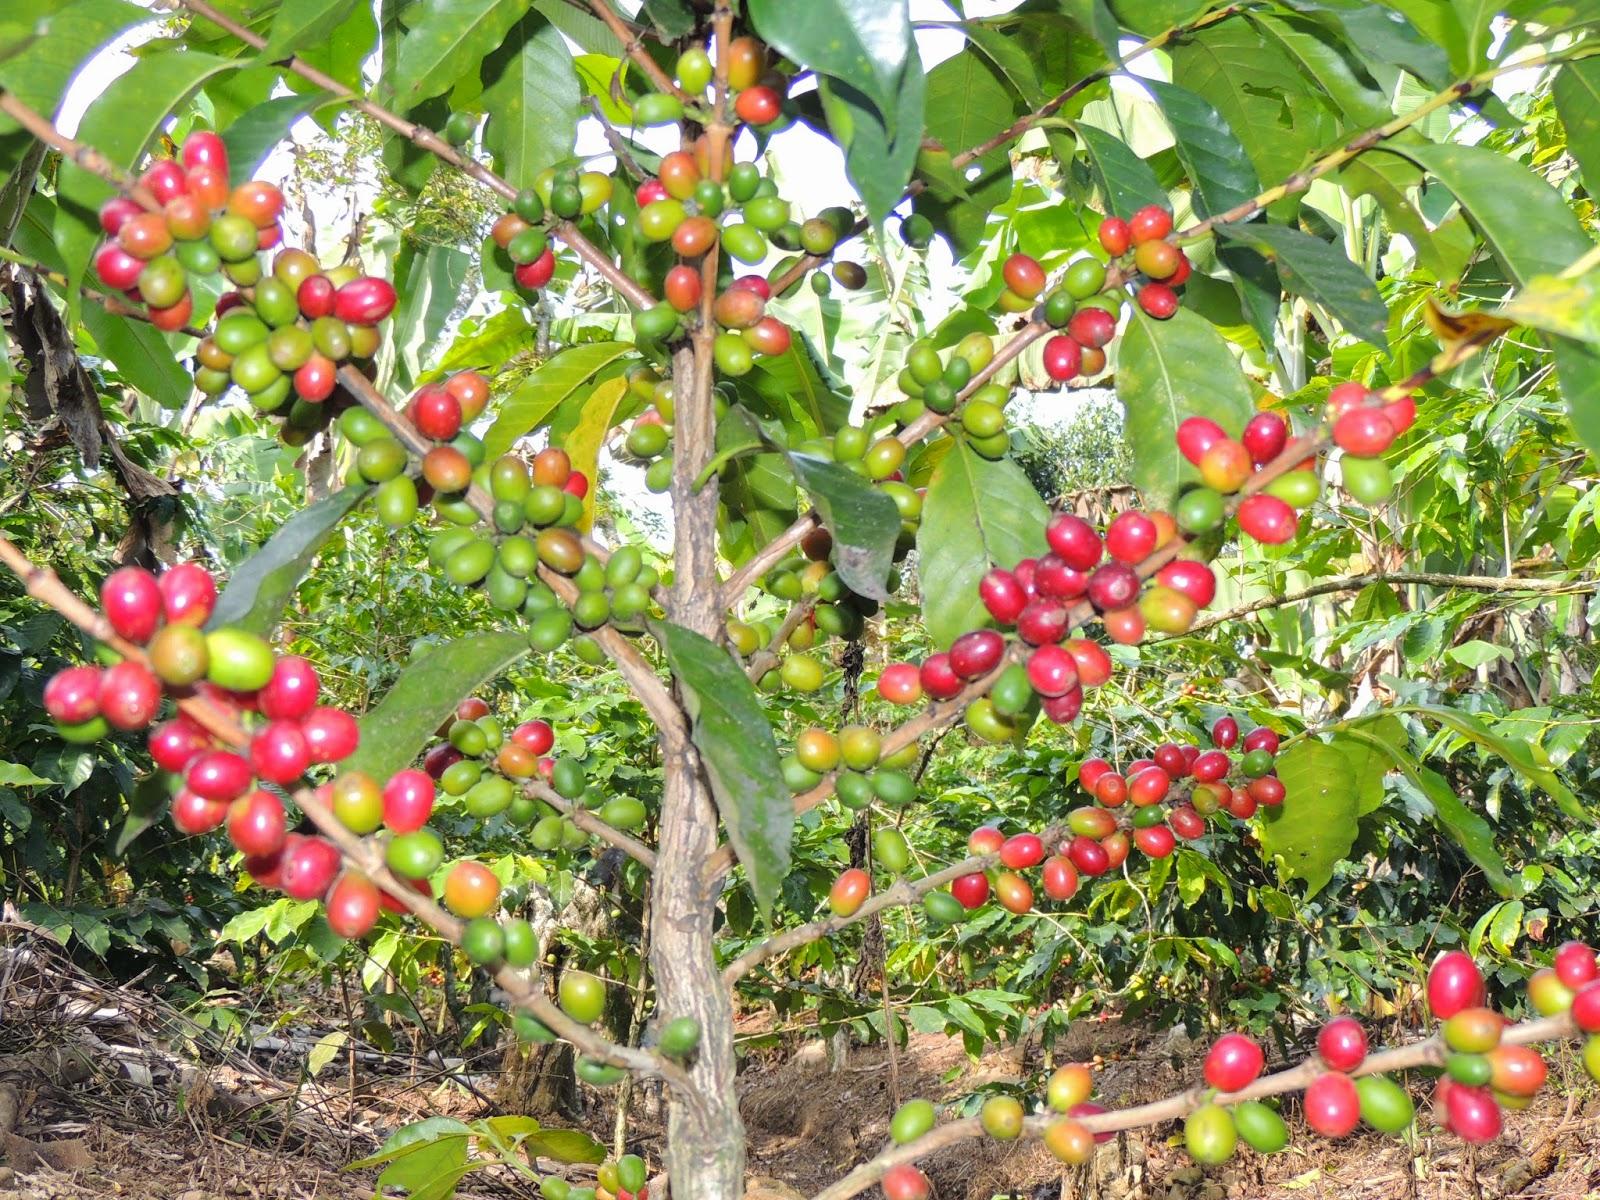 cómo llegó el café a sudamérica licor de café cafres